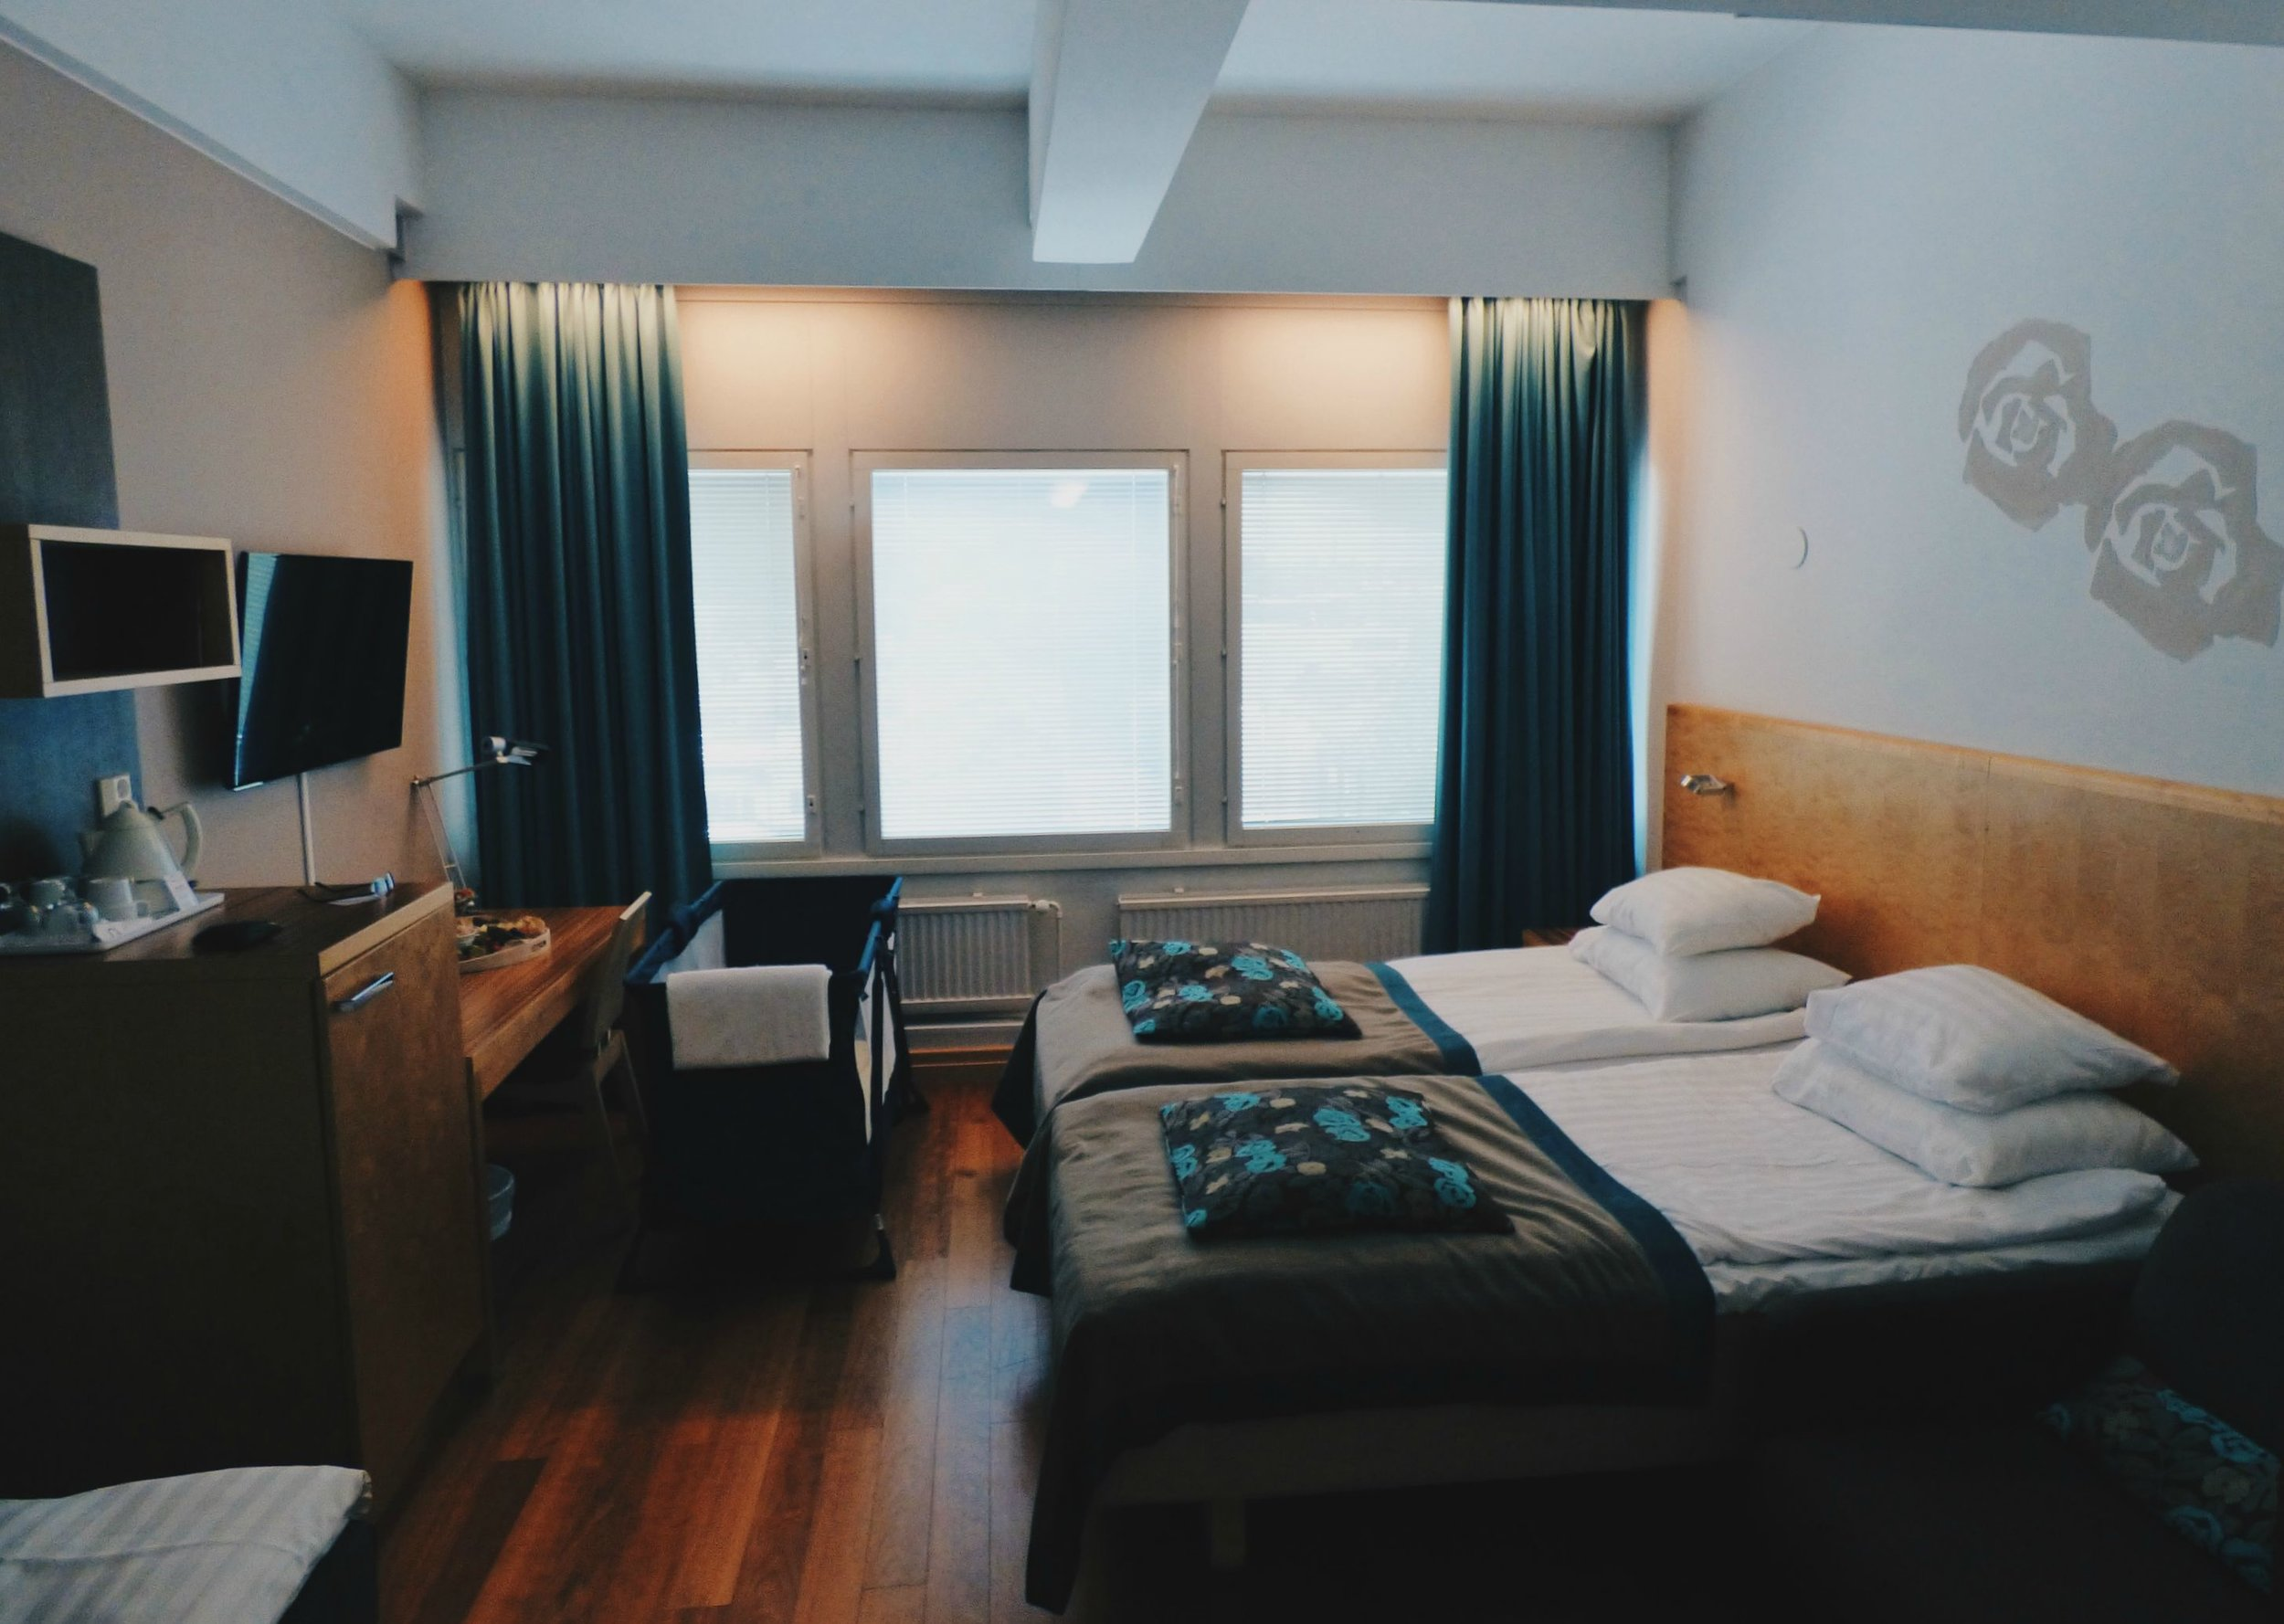 hotel_borssi_huone.jpg